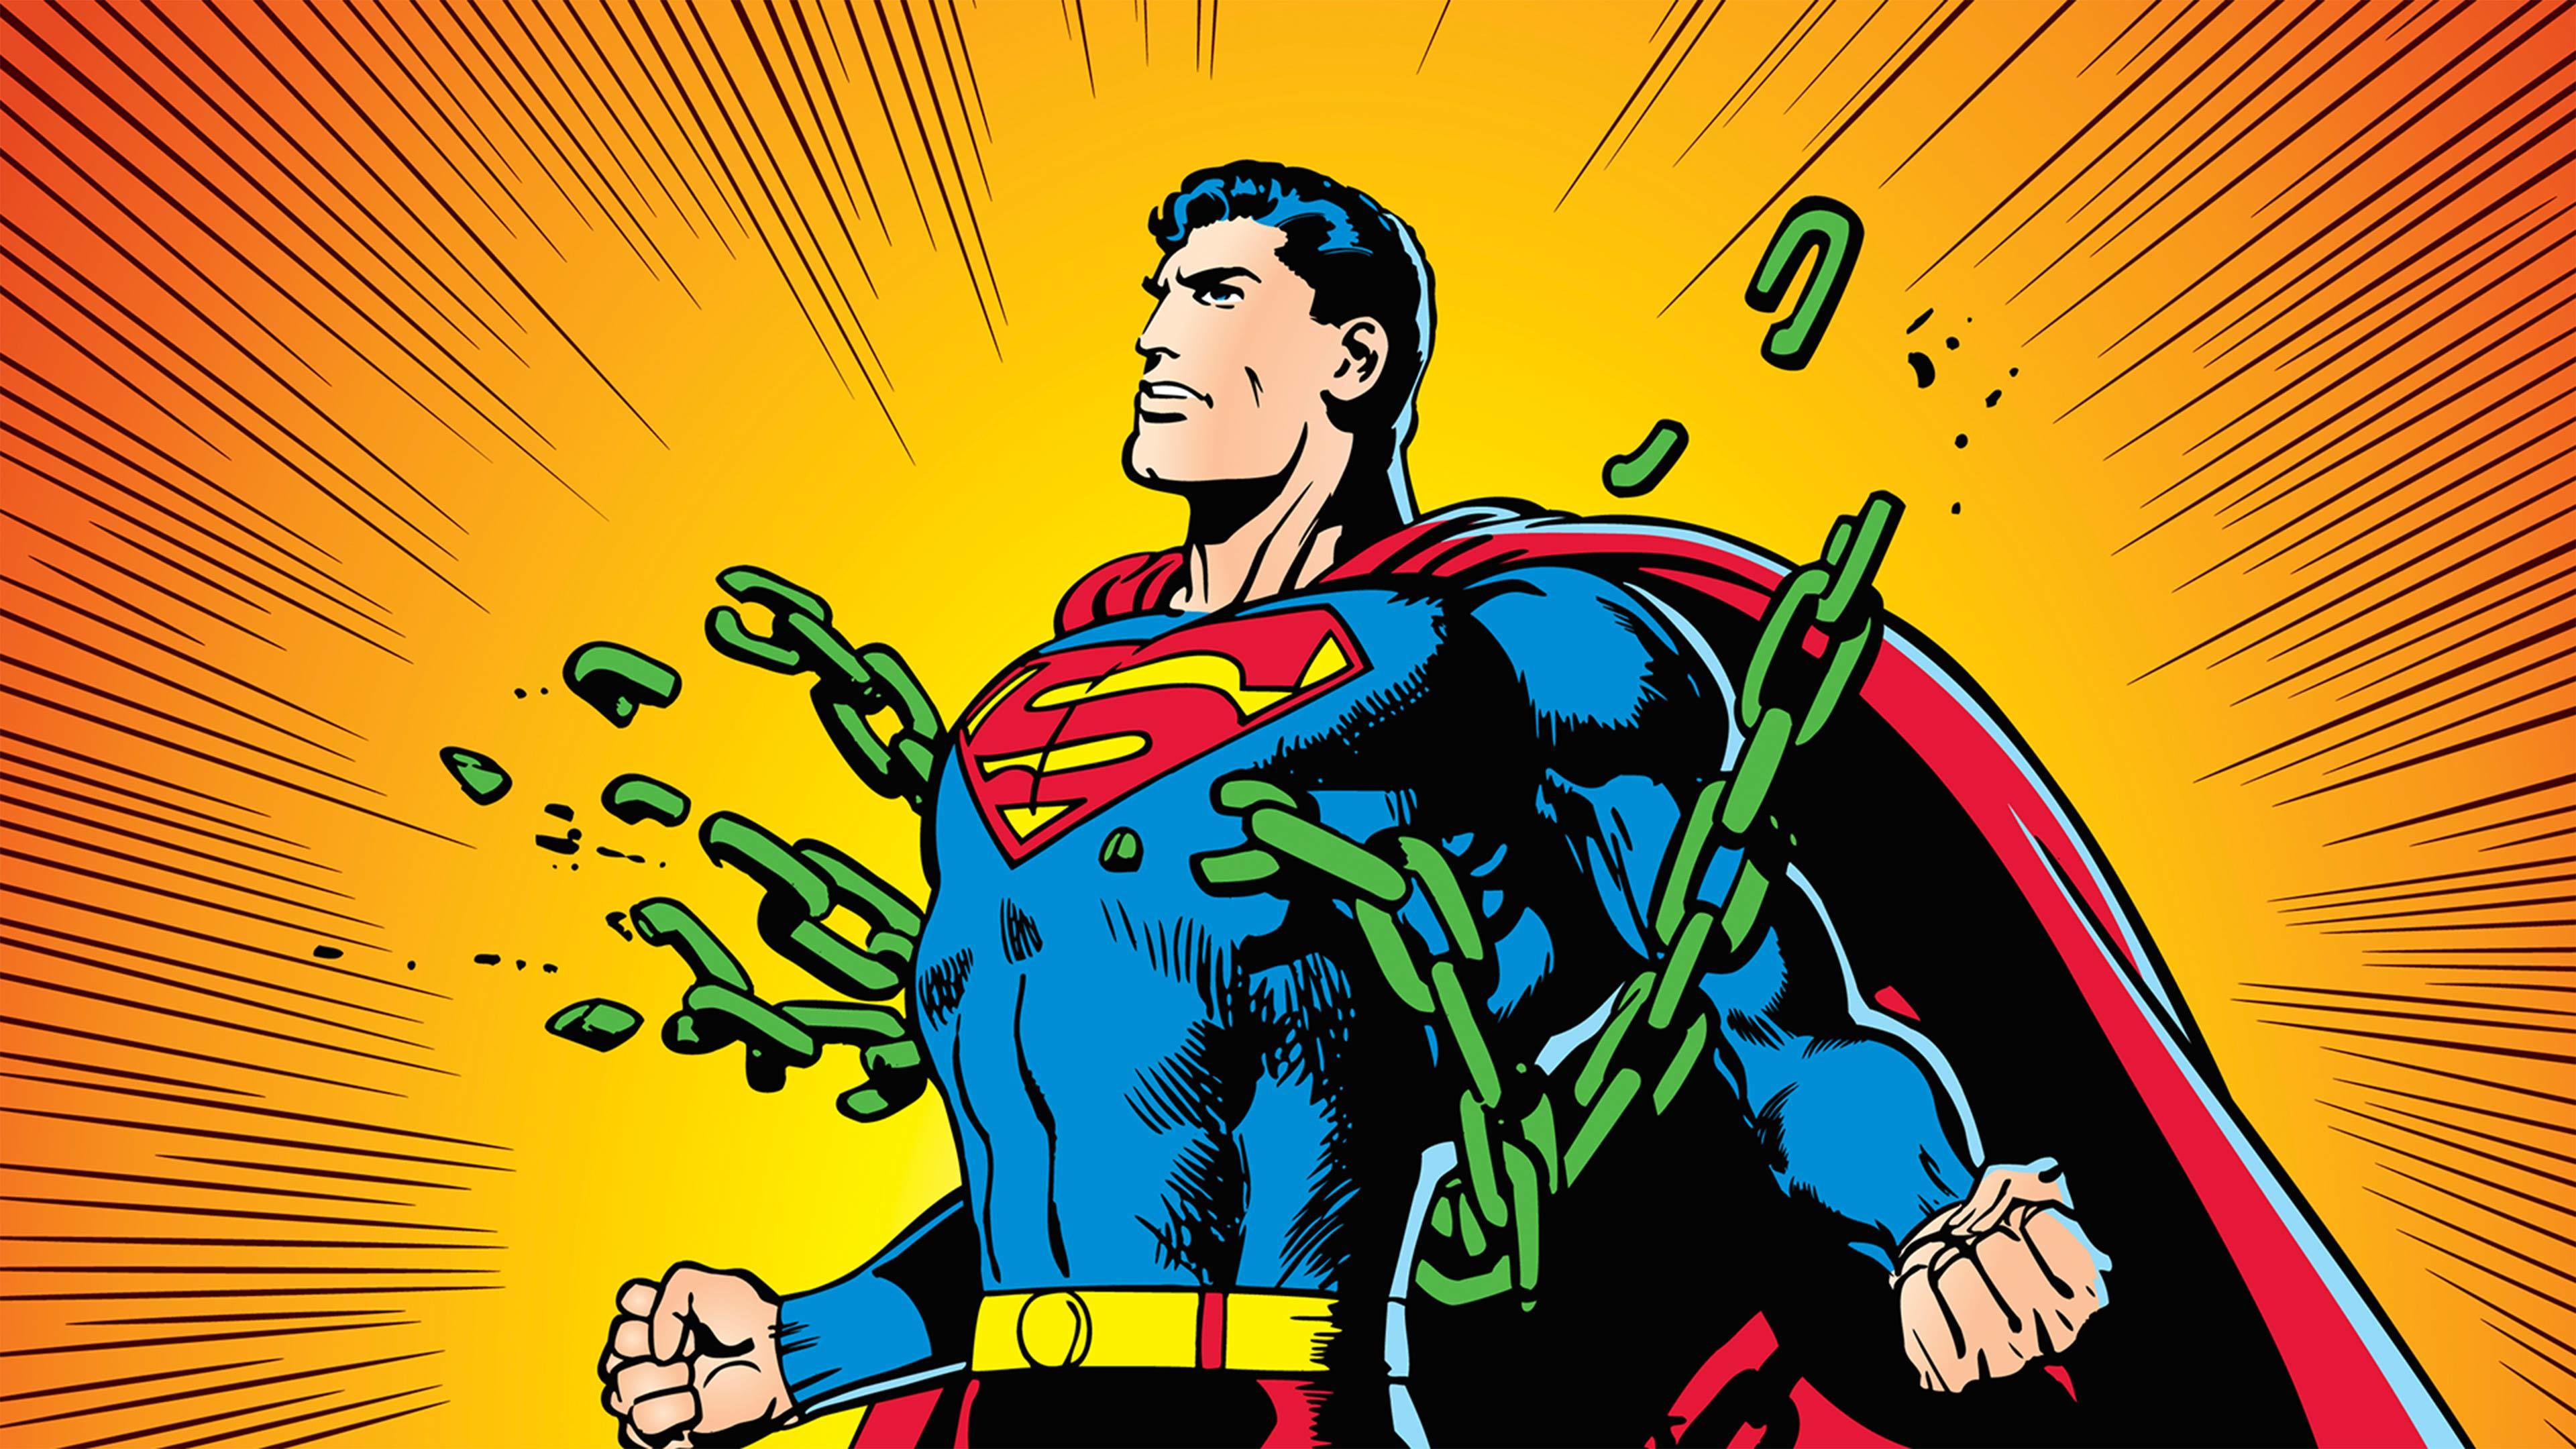 supermansforgottenpowers_news_hero-c_v1_200716.jpg